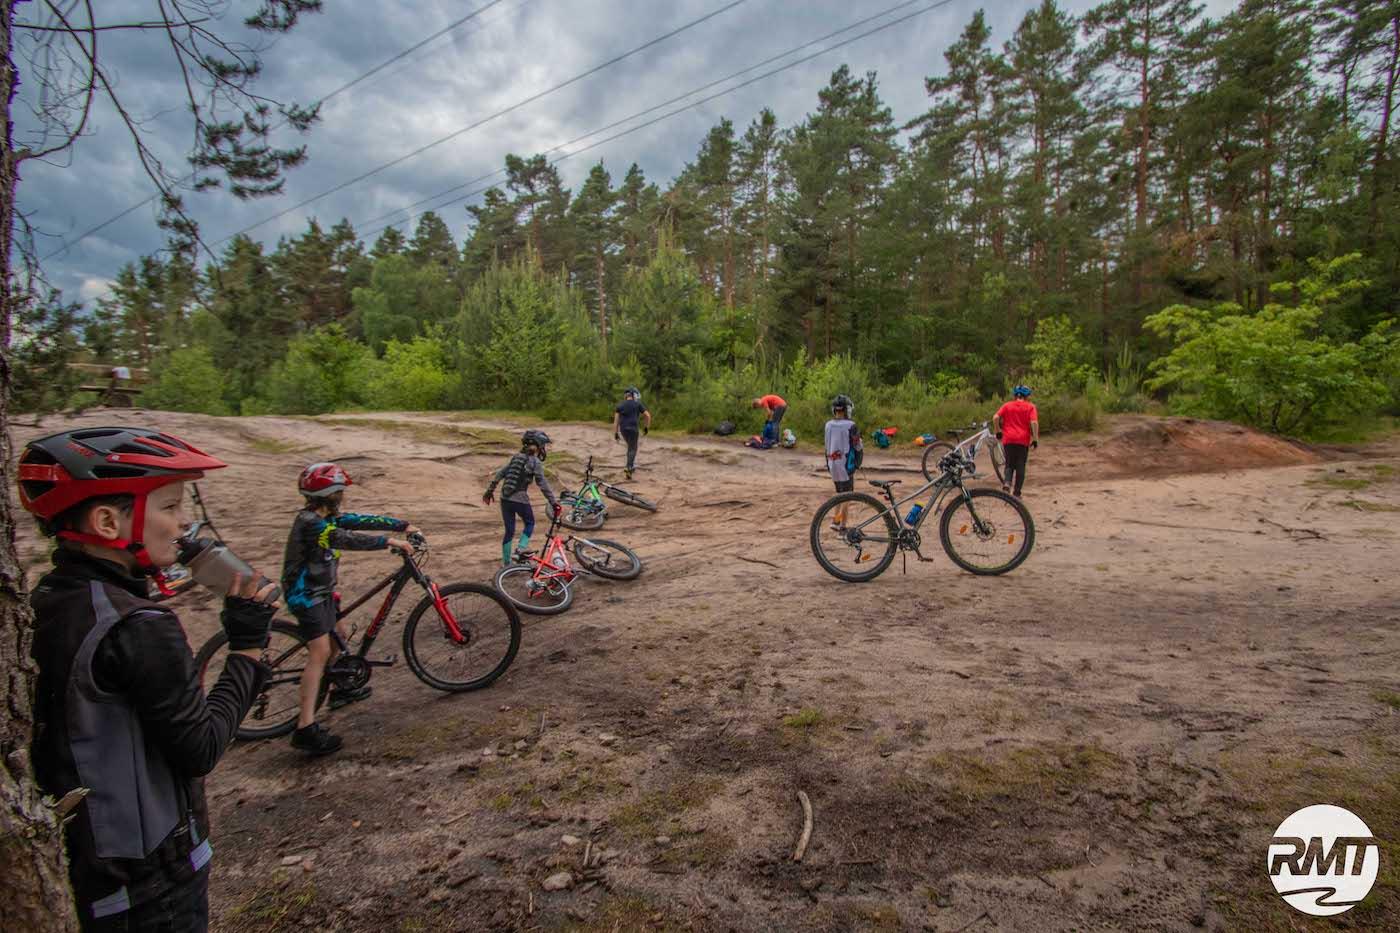 Mountainbike Kinder Kurs in Siegen - 8-12 Jahre Kids - Rock my Trail Fahrtechnik Bikeschule